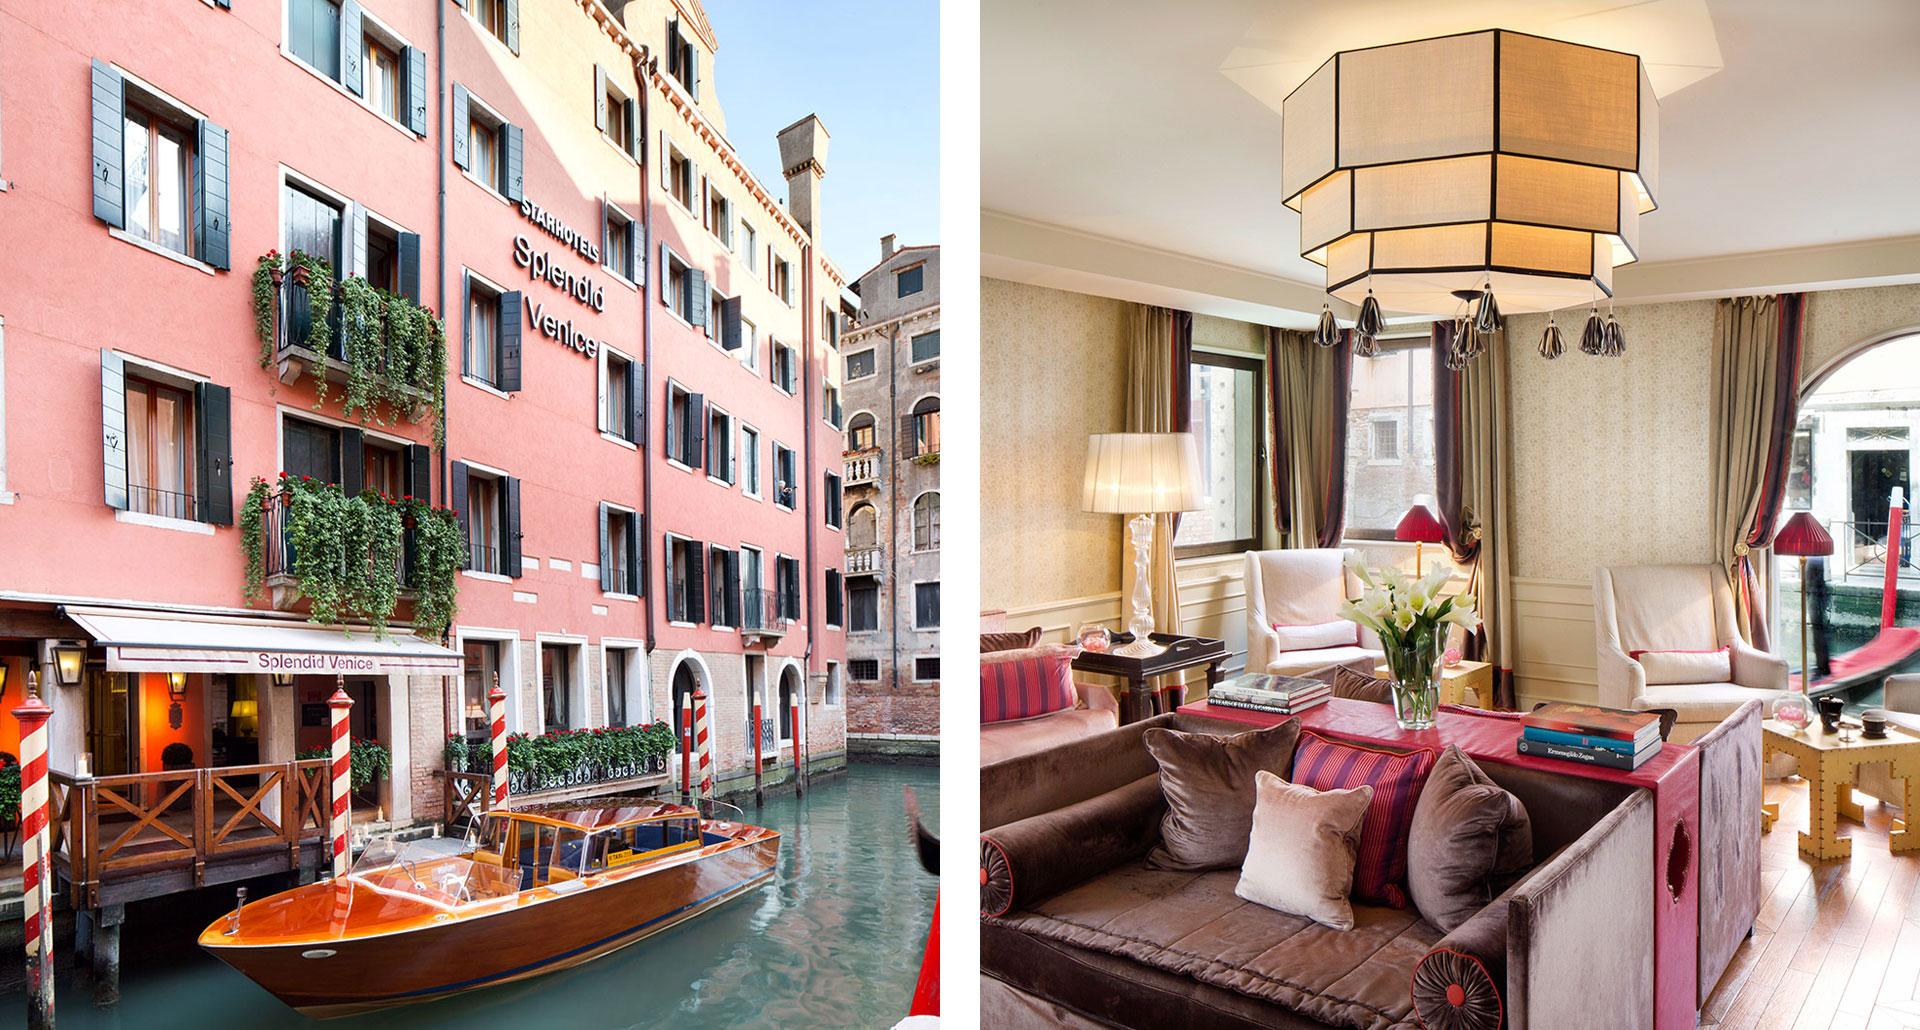 Splendid Venice - boutique hotel in Venice